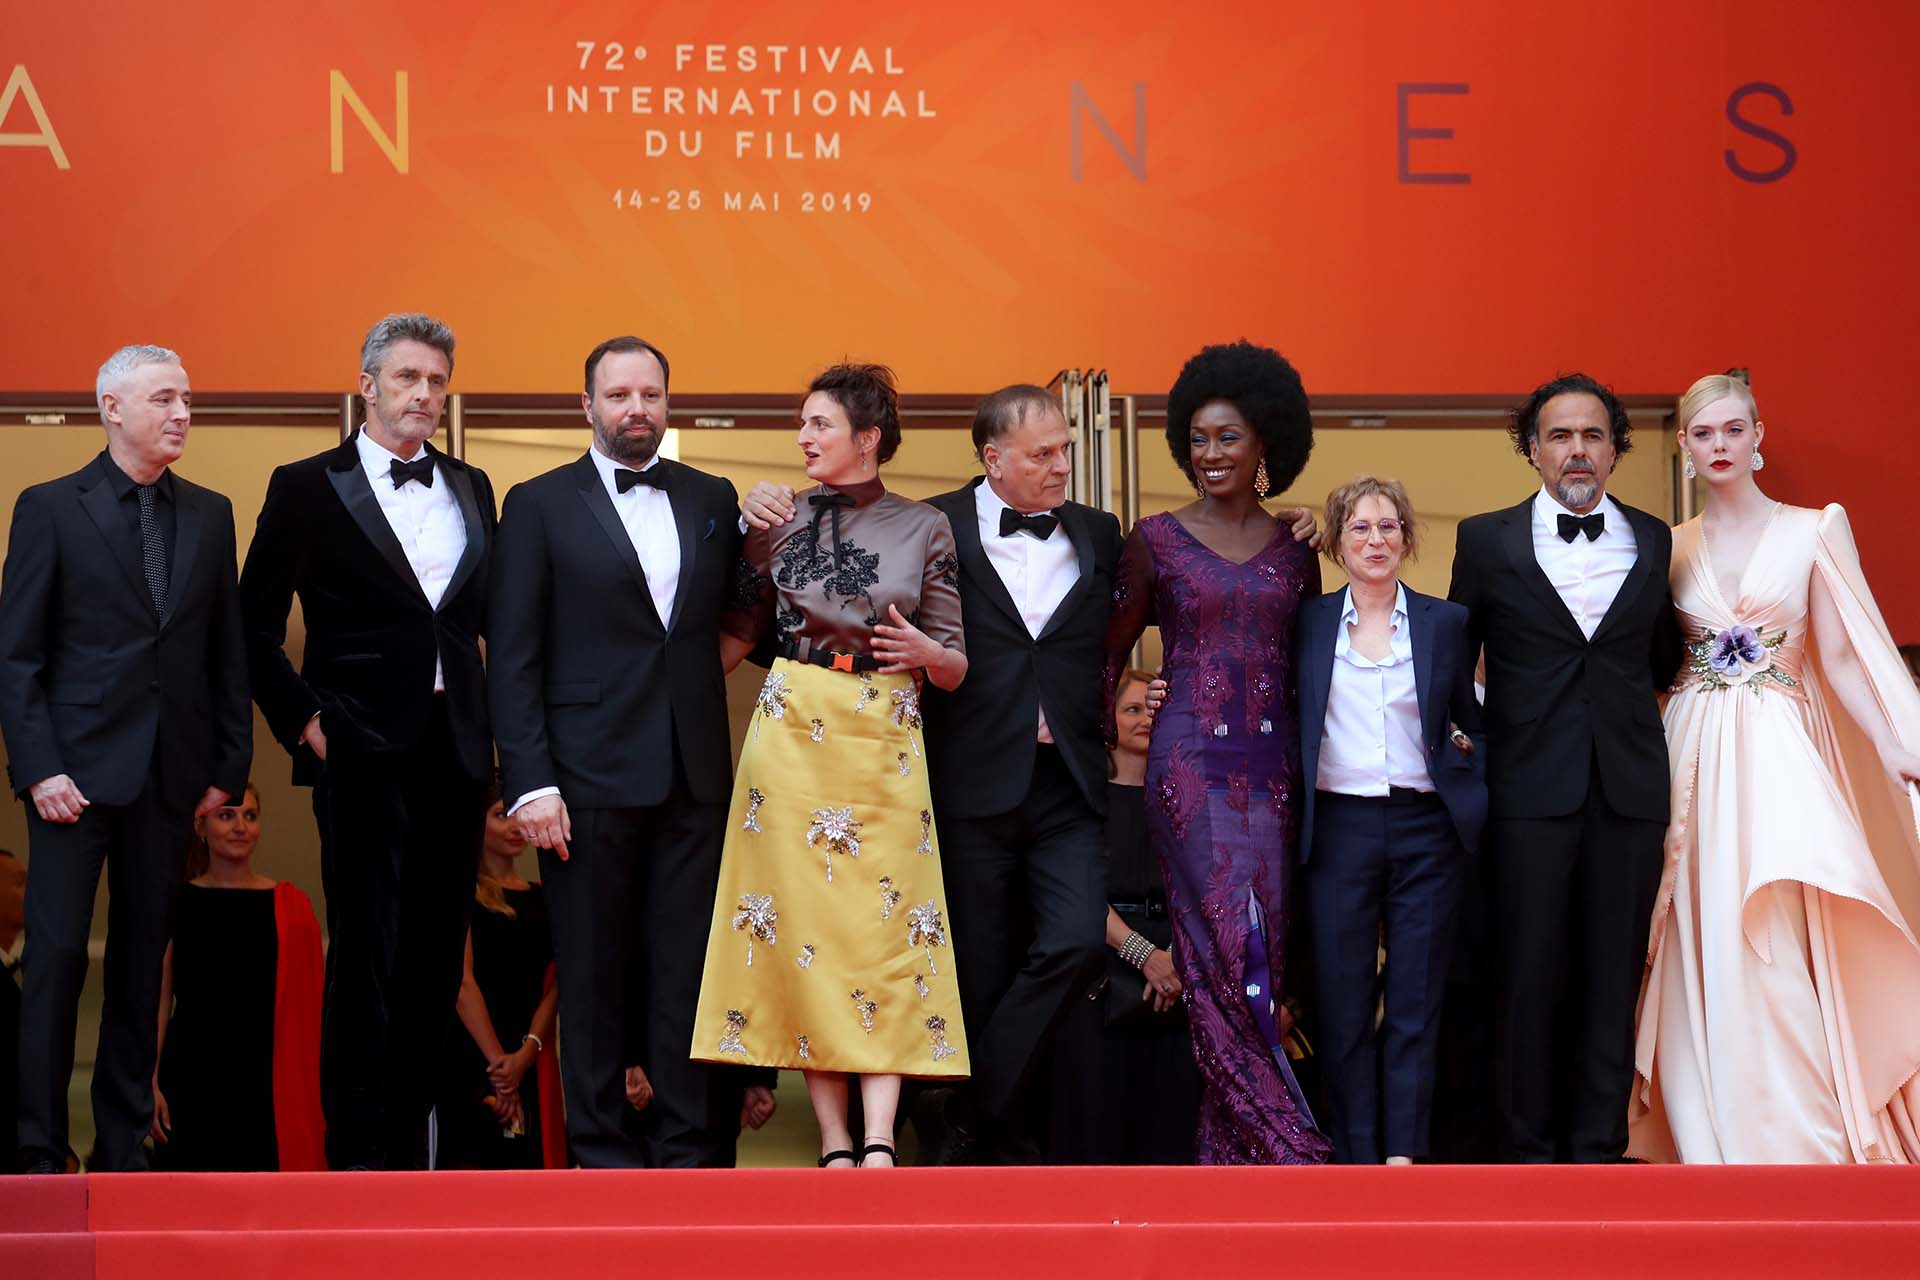 El juradode Cannes 2019: Alejandro González Iñárritu, Alice Rohrwacher, Kelly Reichardt, Yorgos Lanthimos, Robin Campillo, Pawel Pawlikowski, Elle Fanning, Maimouna N'Diaye, y Enki Bilal.